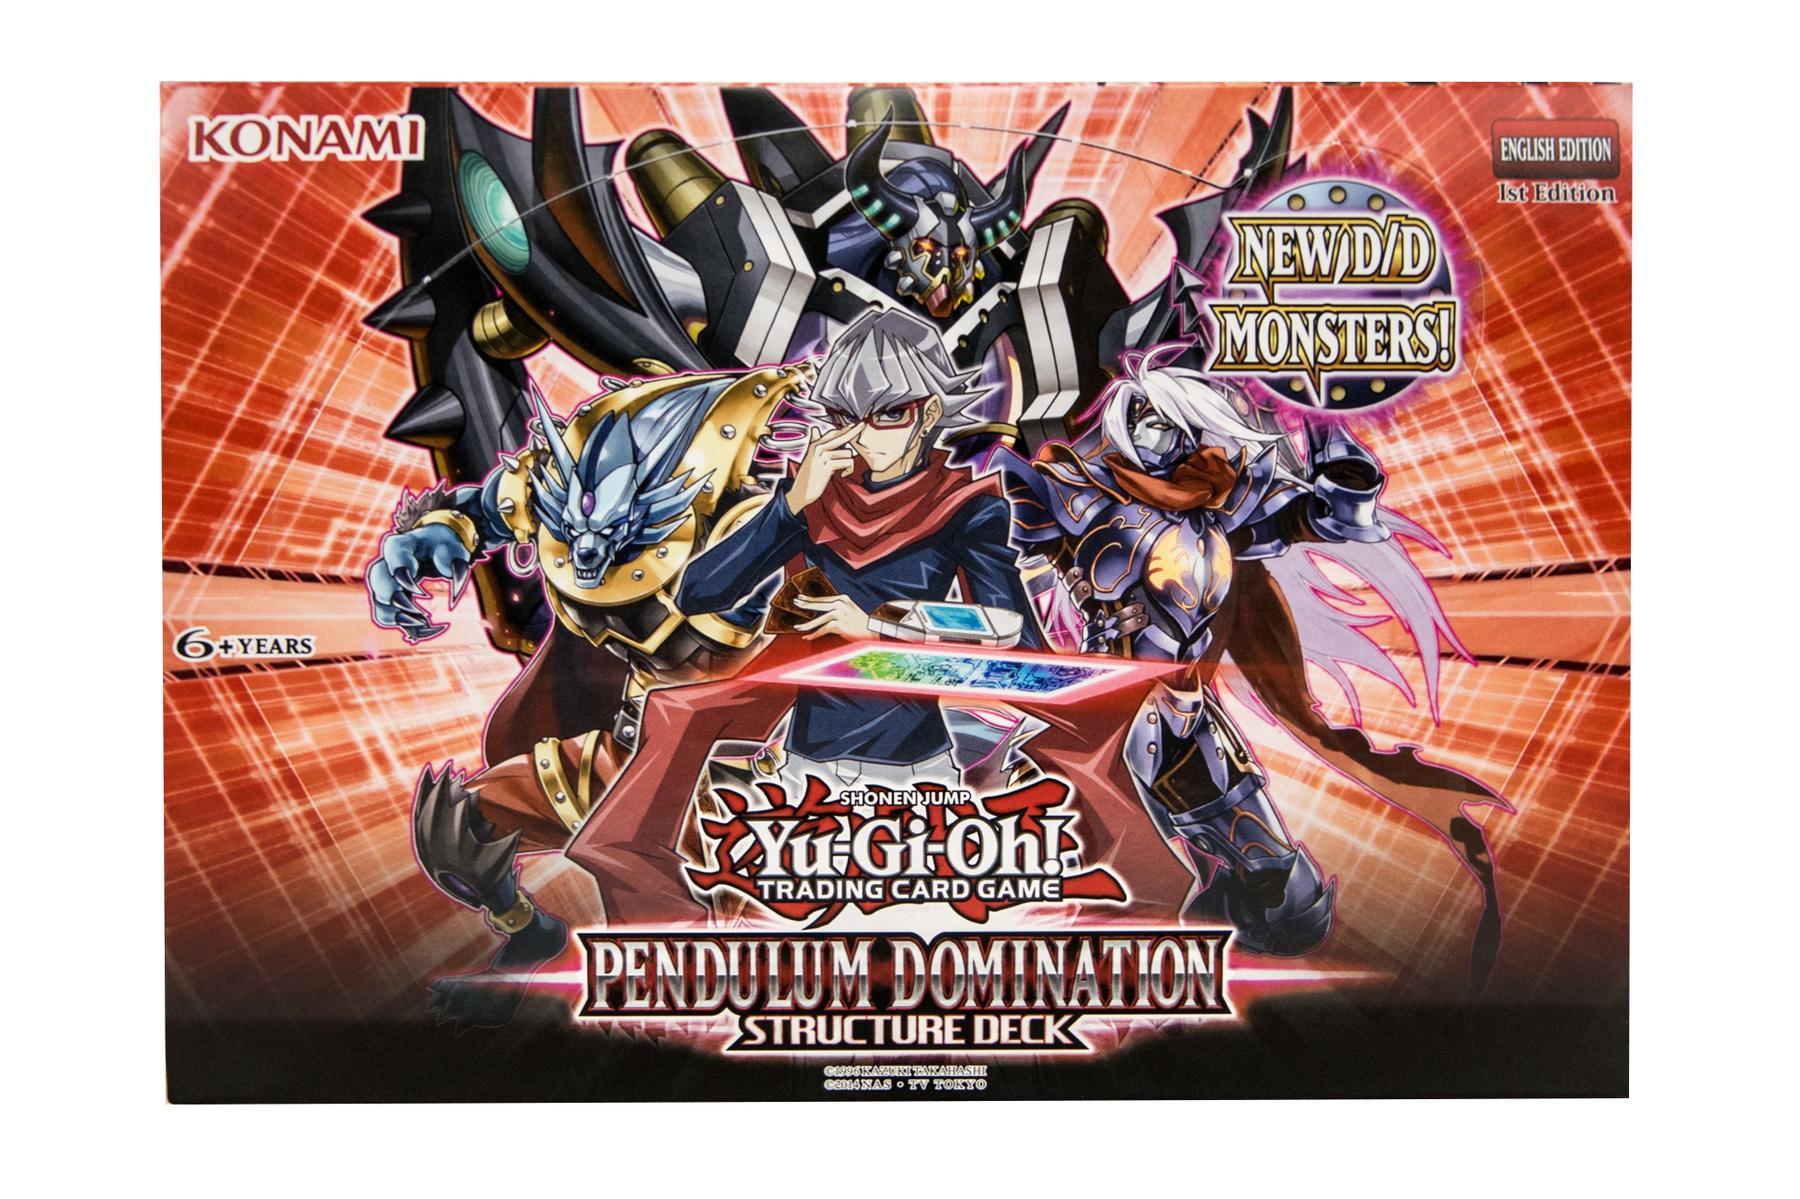 Konami Yu Gi Oh Pendulum Domination Structure Deck Box